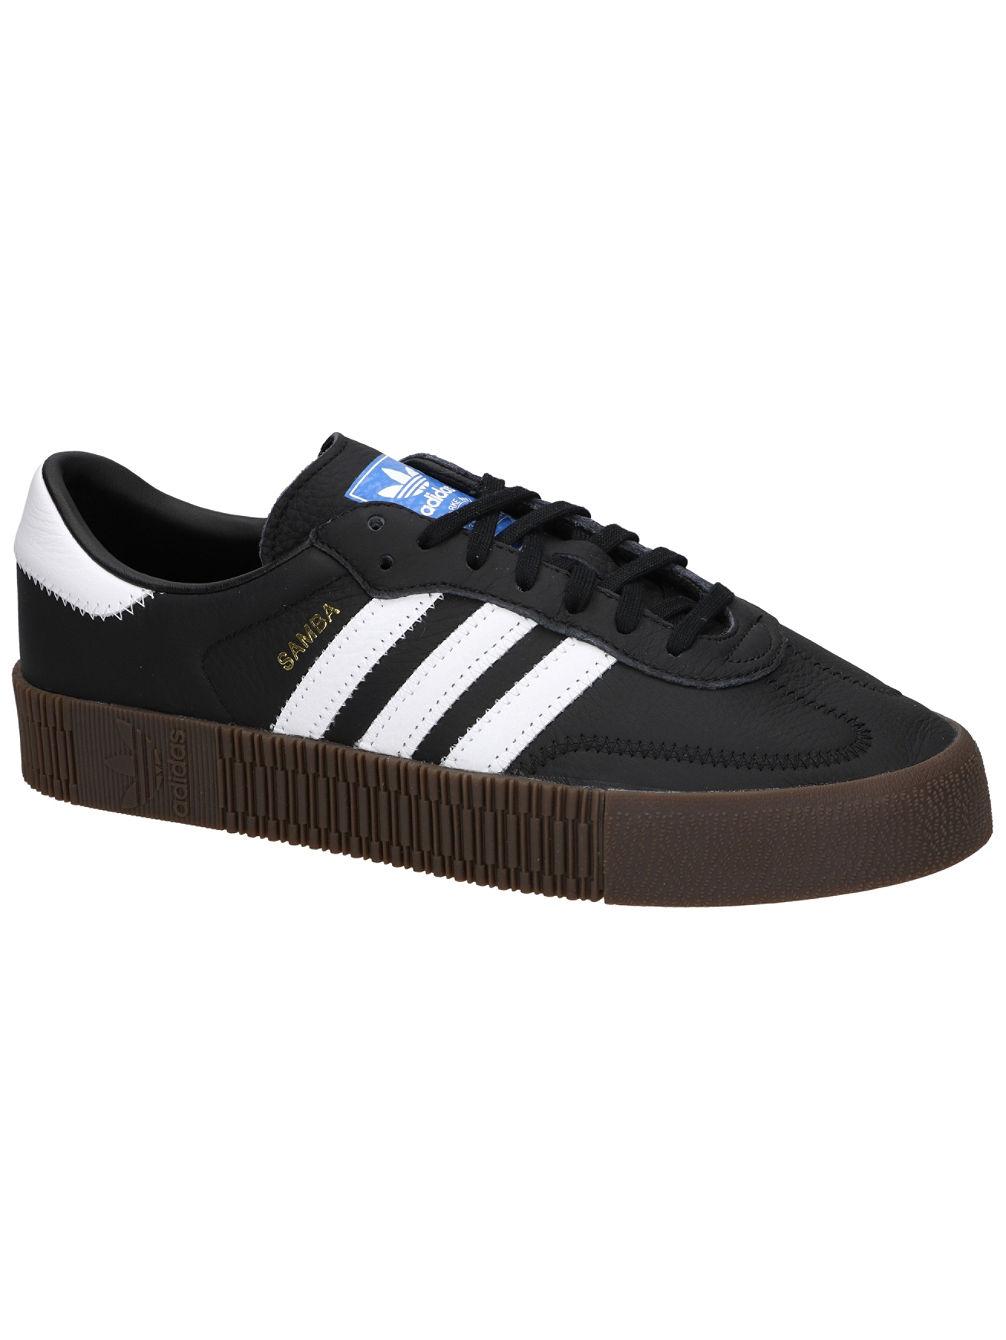 2c478bc38063 Buy adidas Originals Sambarose Sneakers online at Blue Tomato